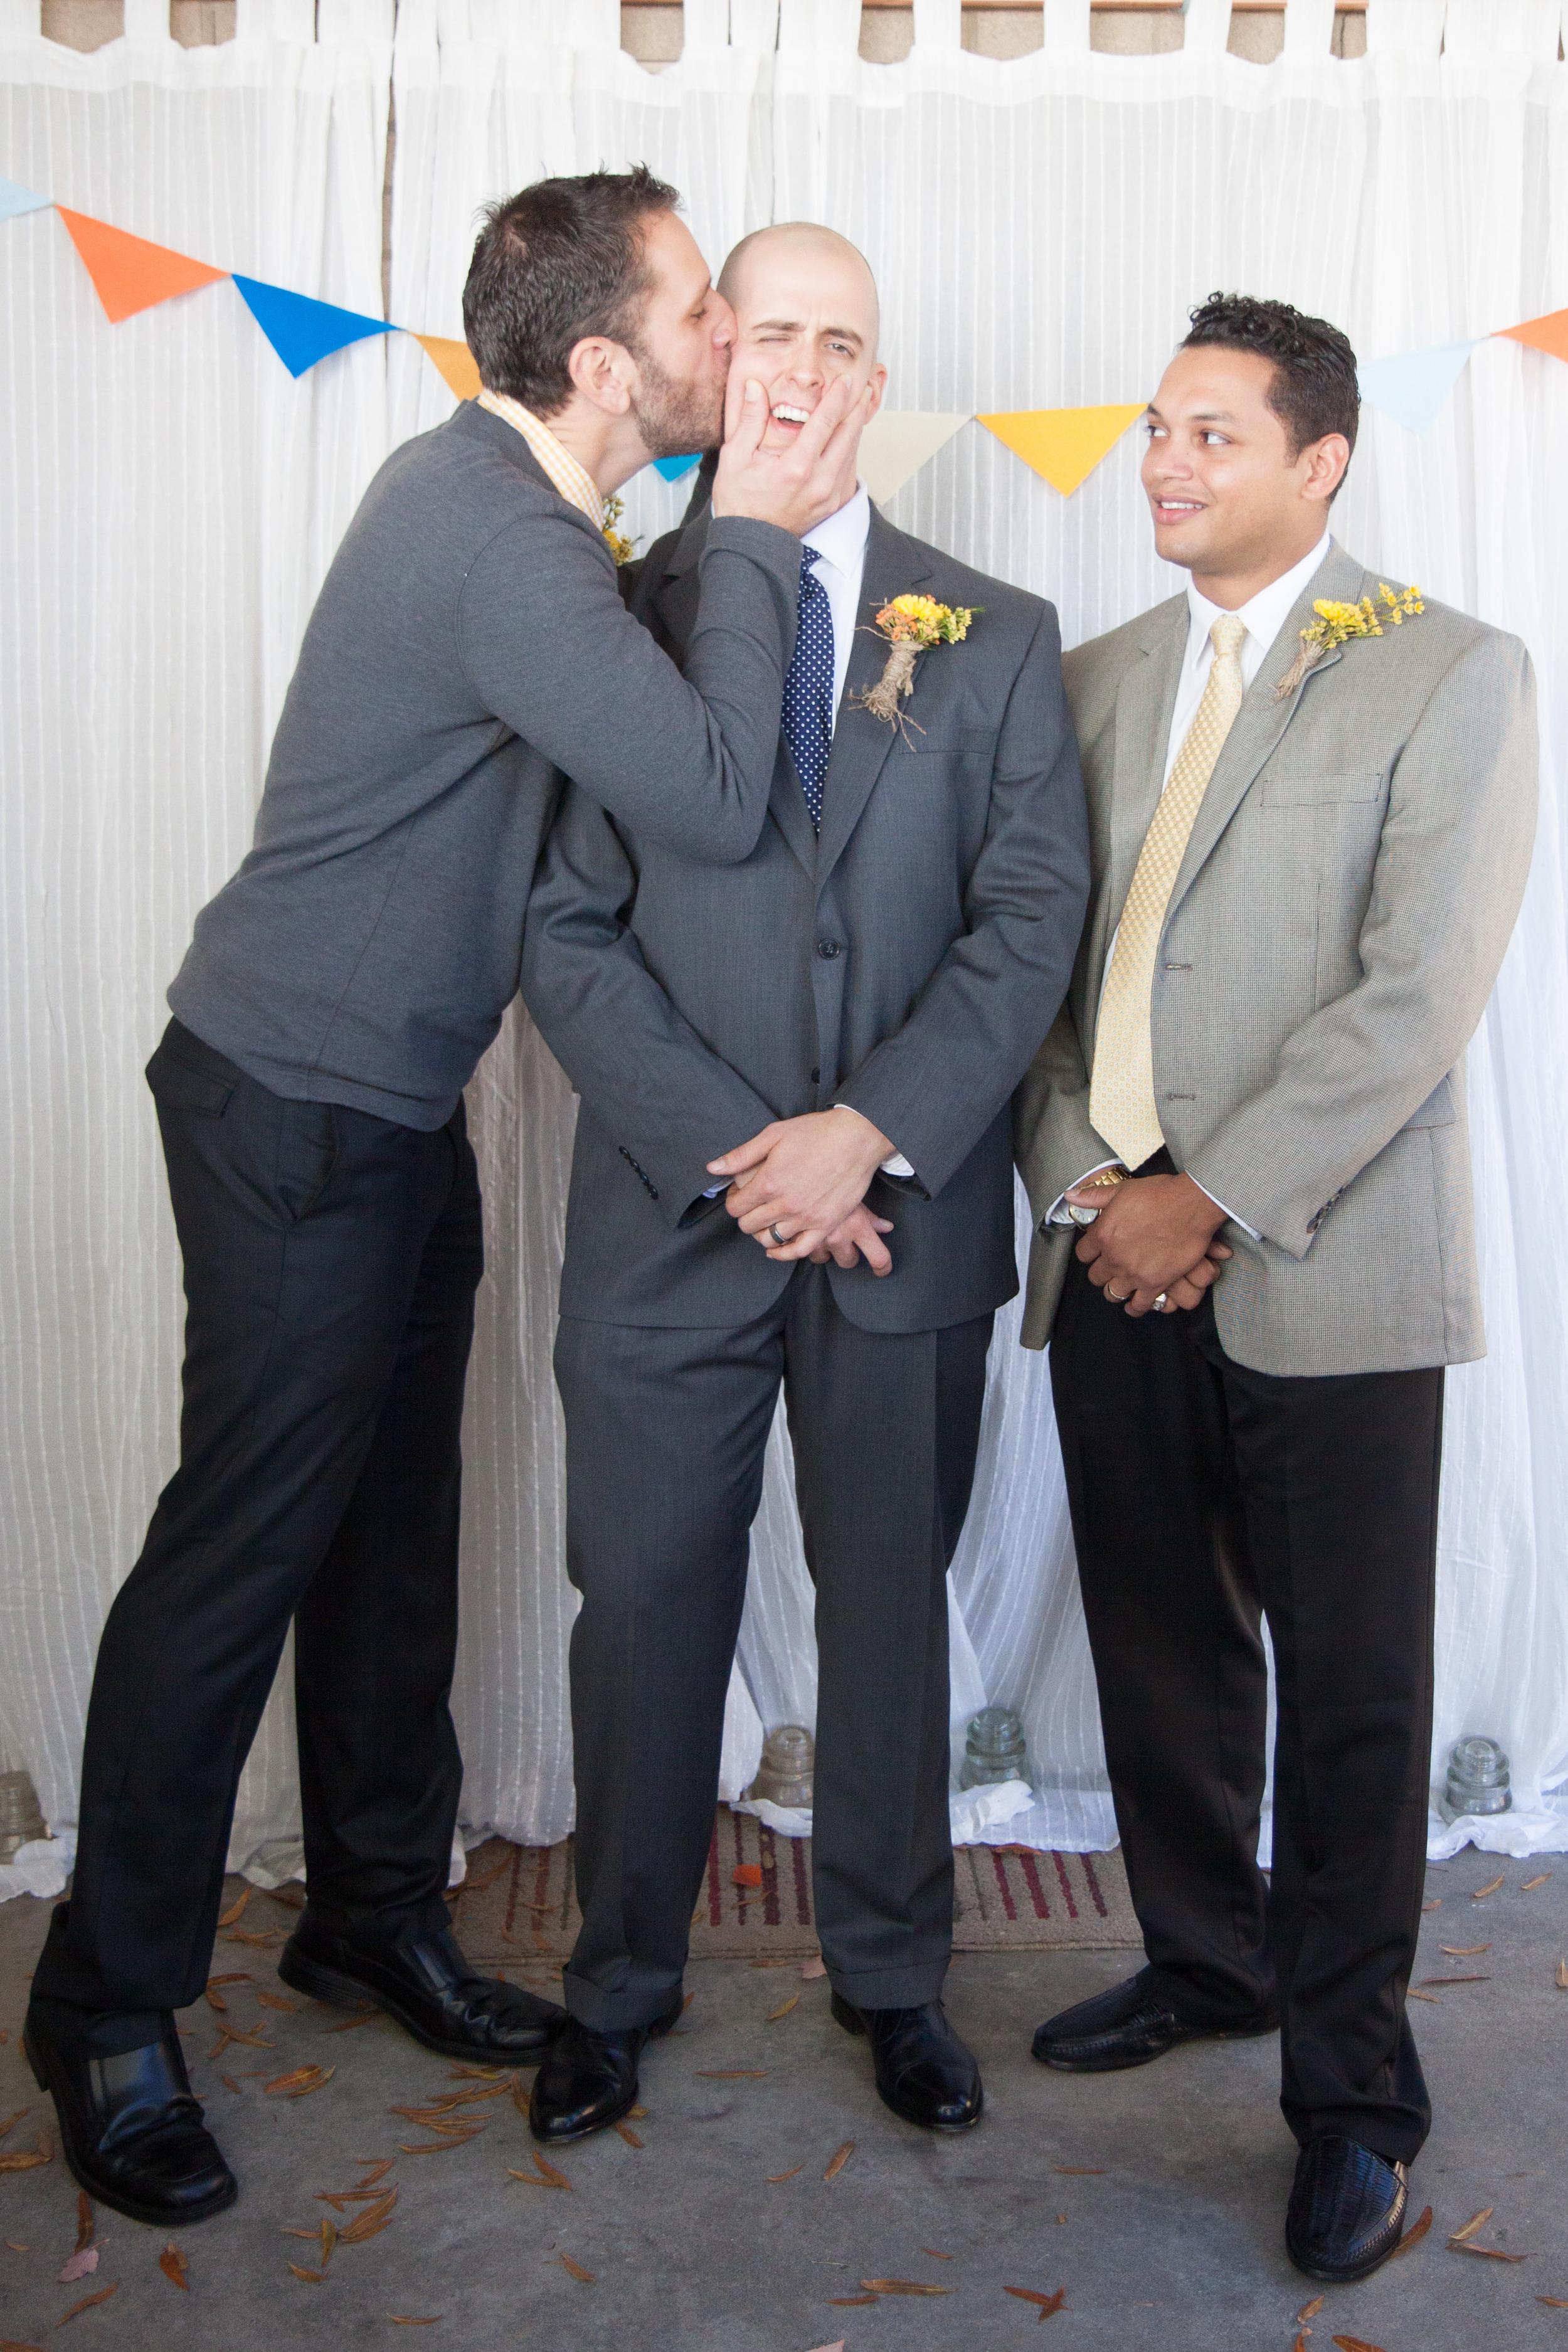 Wilson Bickel Wedding - Family Photos (7 of 25).jpg